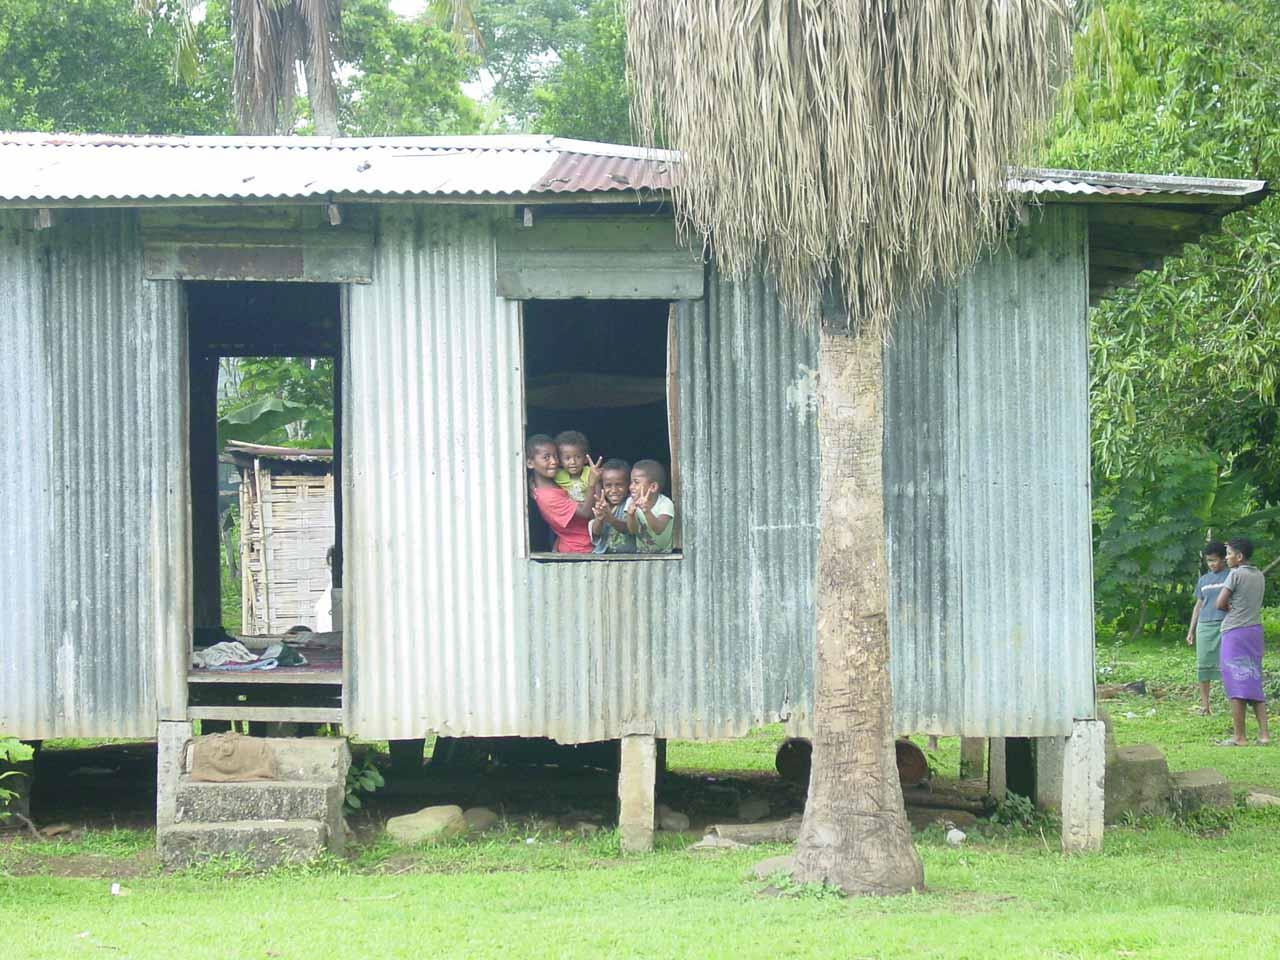 Fijian kids in the village of Nakavika